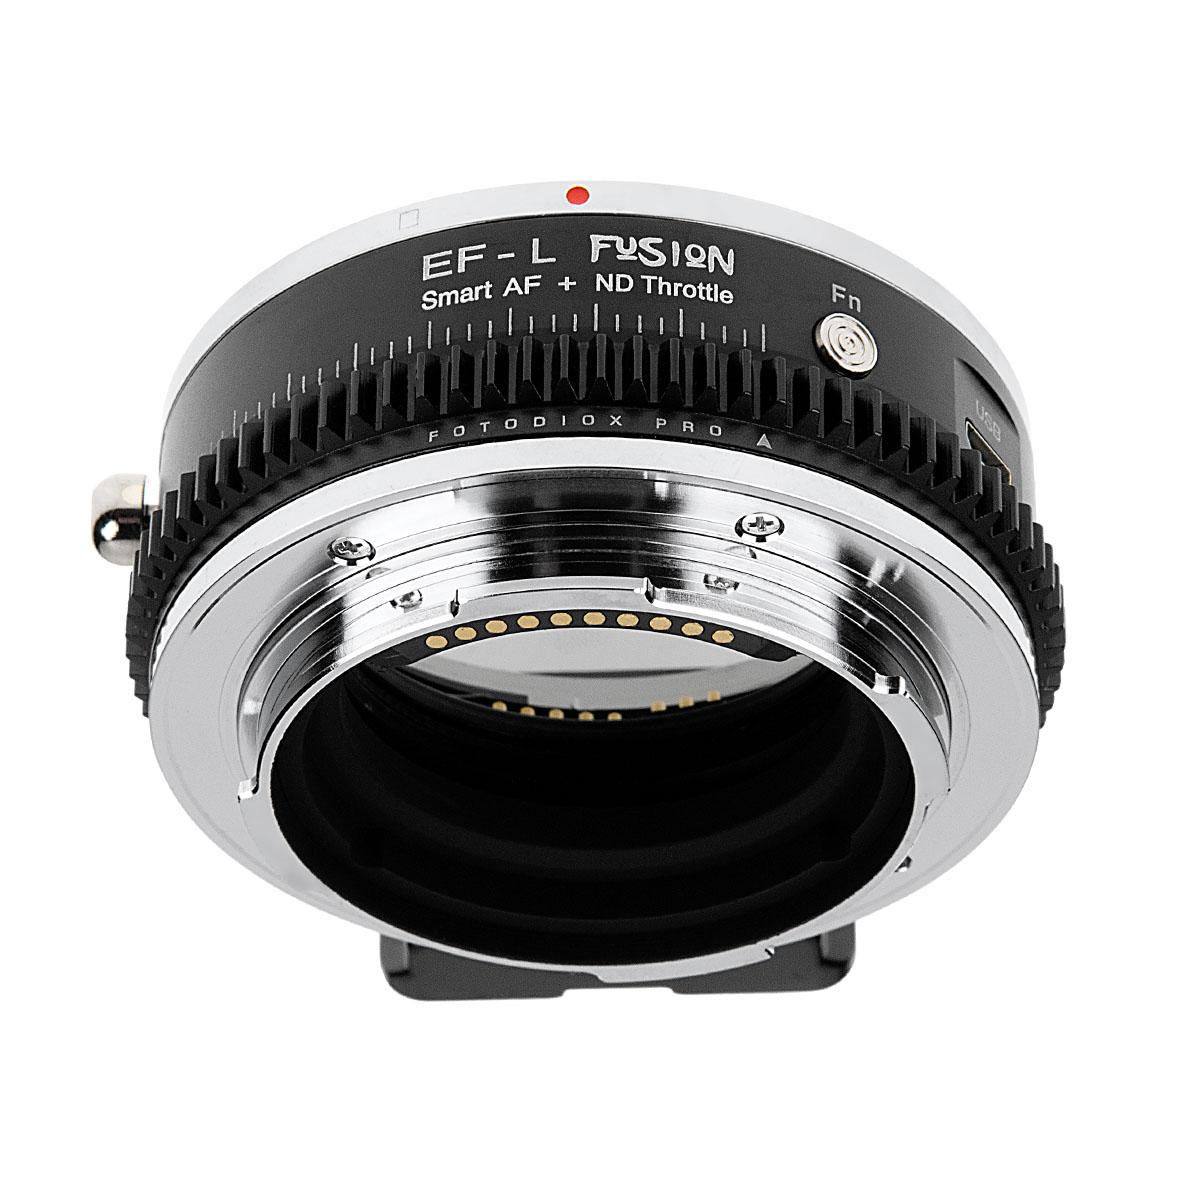 Fotodiox EF-LT-FSN-NDT(キヤノンEFマウントレンズ → Lマウント[バヨネット]変換)電子マウントアダプター 可変式NDフィルター内蔵 ファンクションボタン搭載